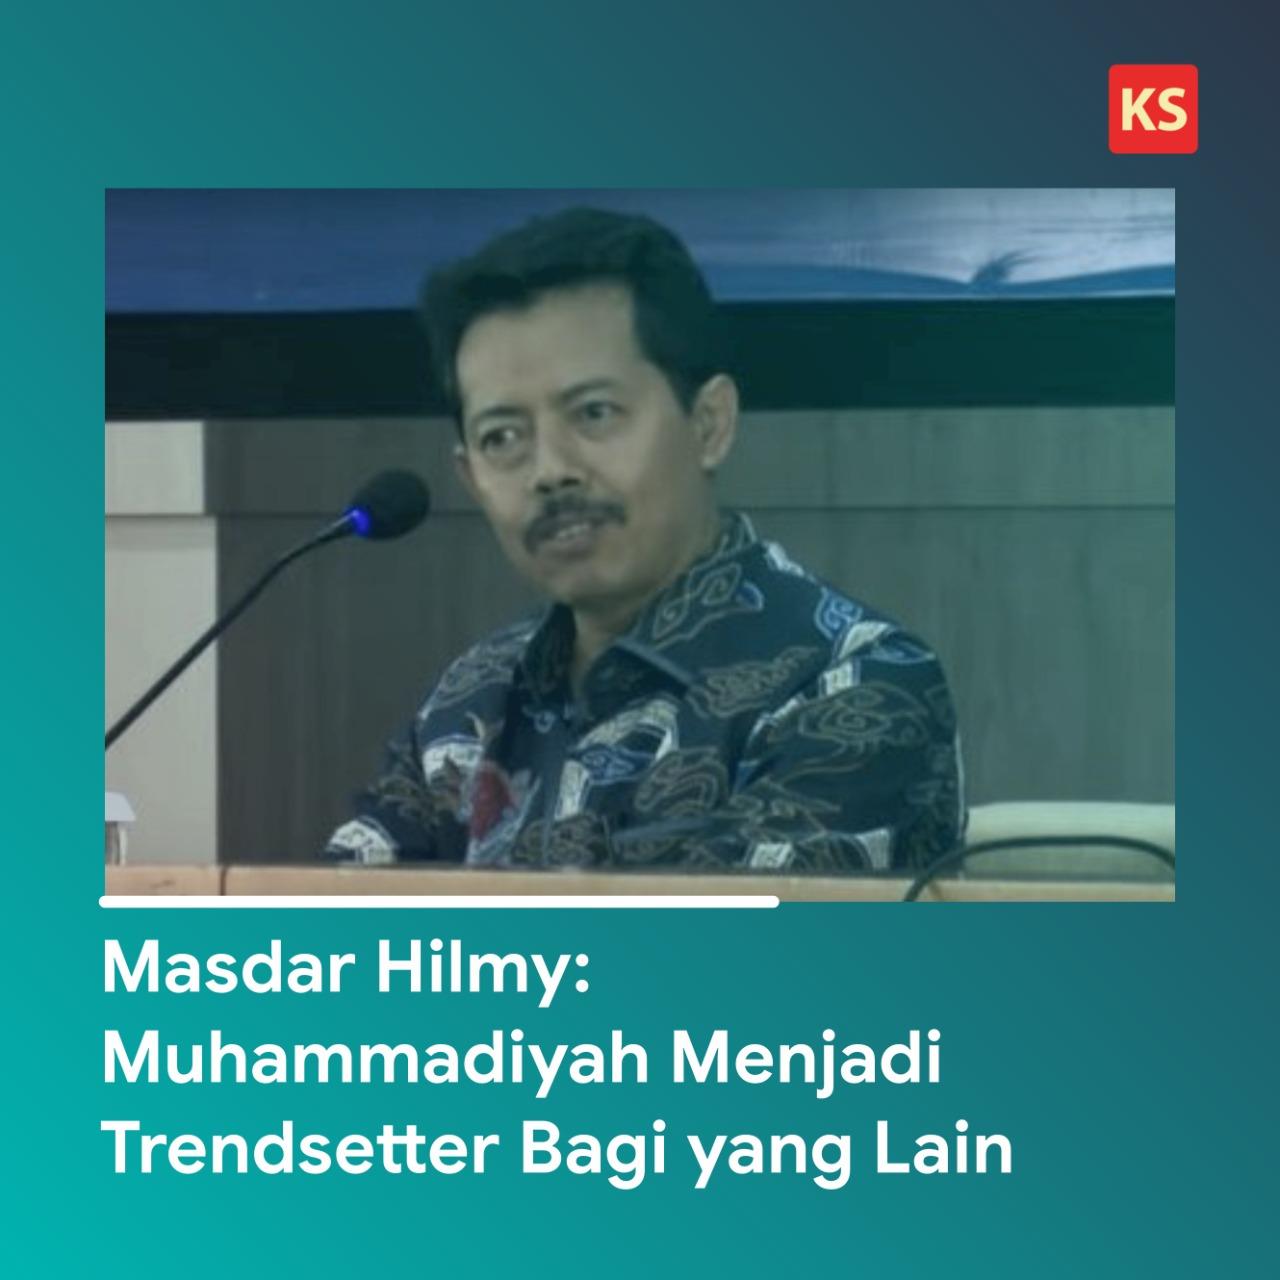 Masdar Hilmy: Muhammadiyah Menjadi Trendsetter Bagi yang Lain